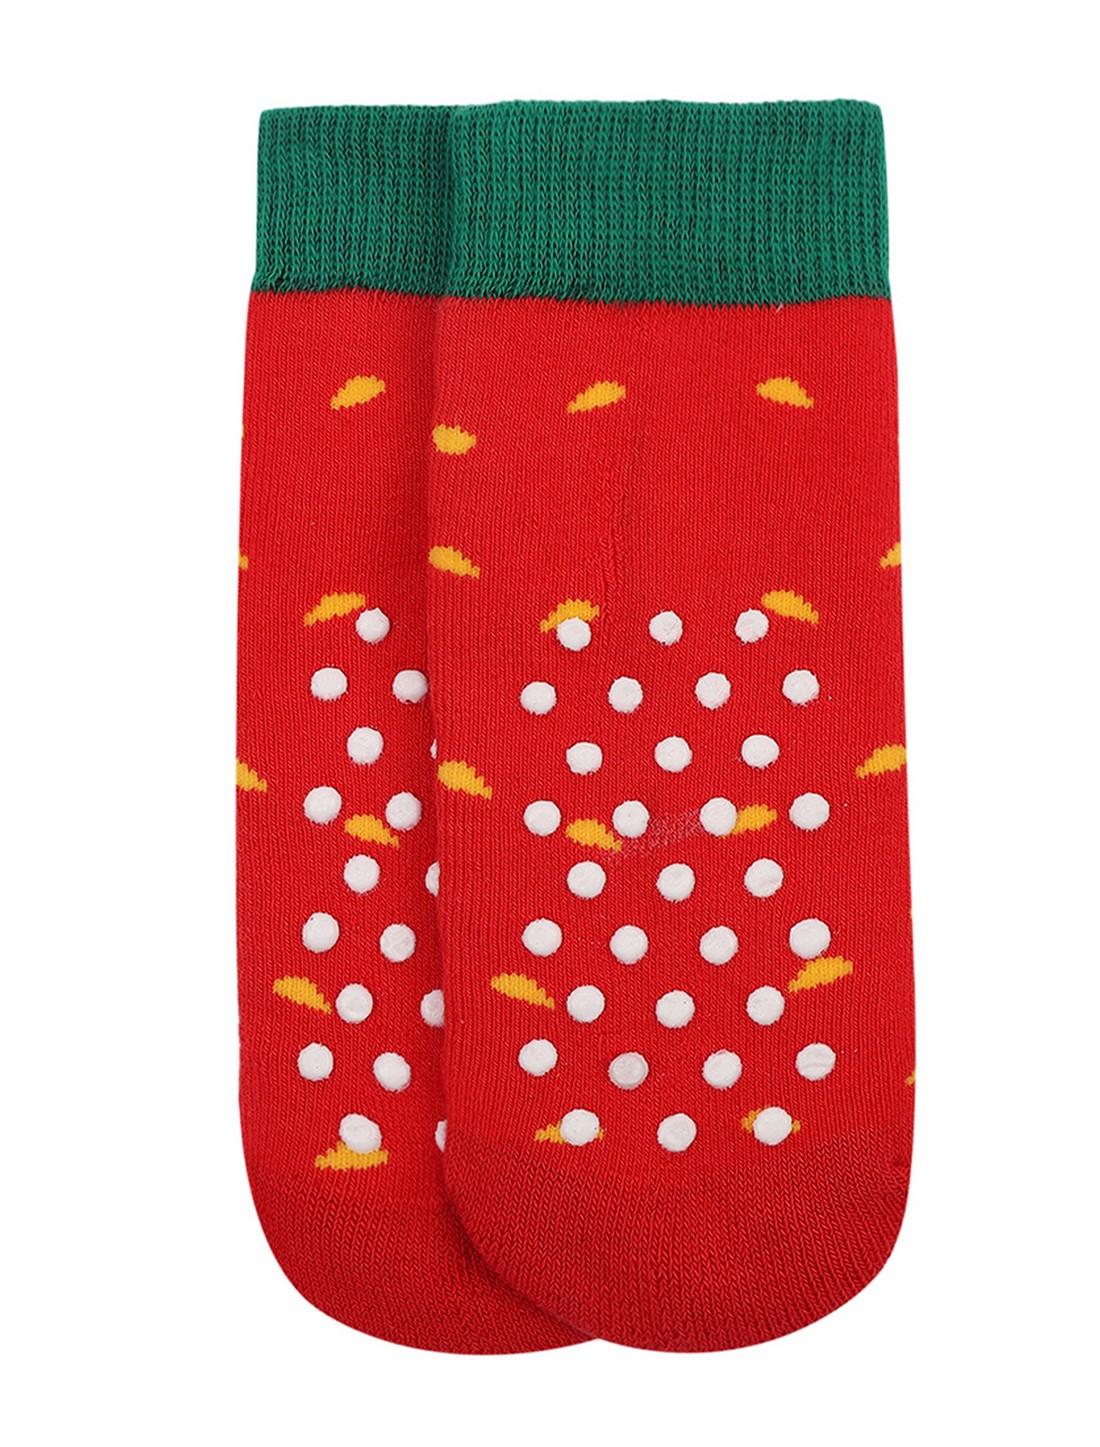 Soxytoes | Soxytoes Watermelon Cotton Crew Length Red Kids Socks-Age (0-2 Years)